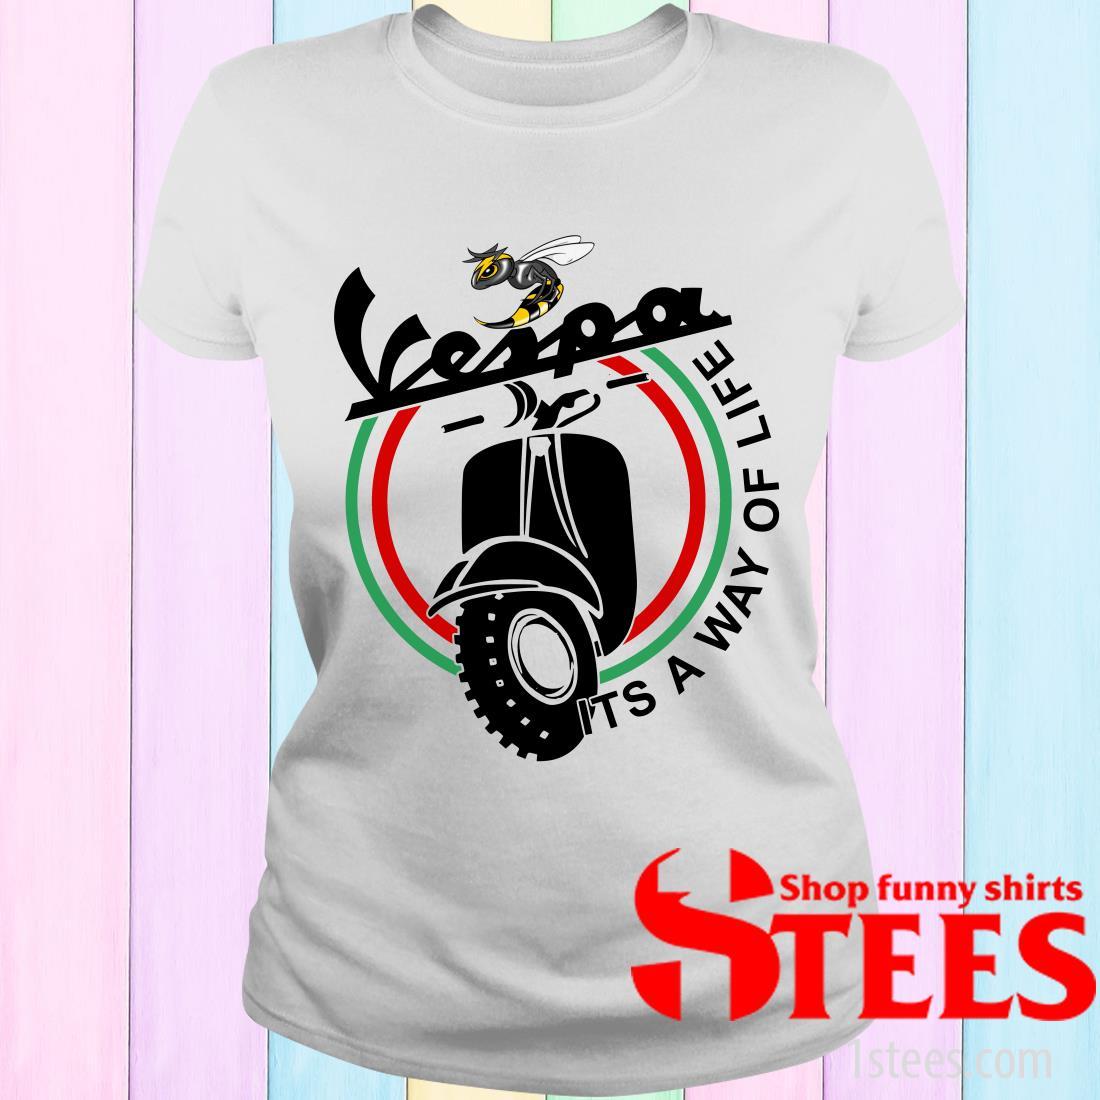 Vespa It's A Way Of Life Women's T-Shirt